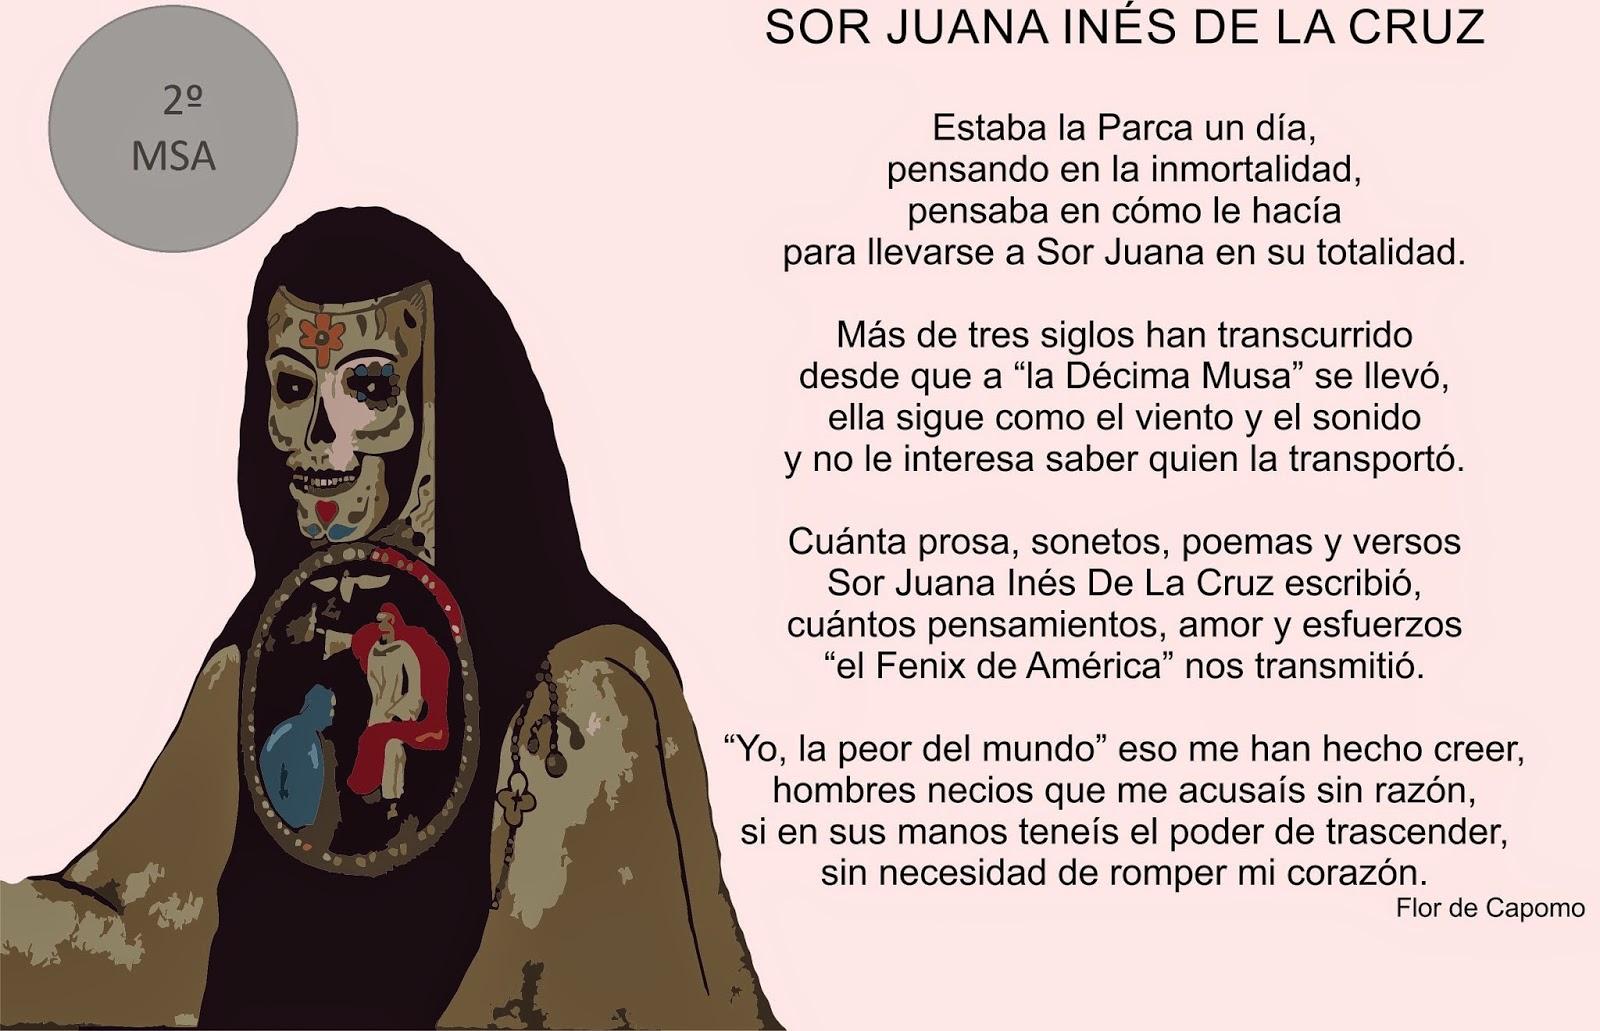 http://3.bp.blogspot.com/-8PaLPsAIvQA/VFjQrZcmmsI/AAAAAAAB5MI/WKAp4xMlBjE/s1600/2FlorDeCapomo_Tamaulipas_YonseiUniversity_calavera3.jpg